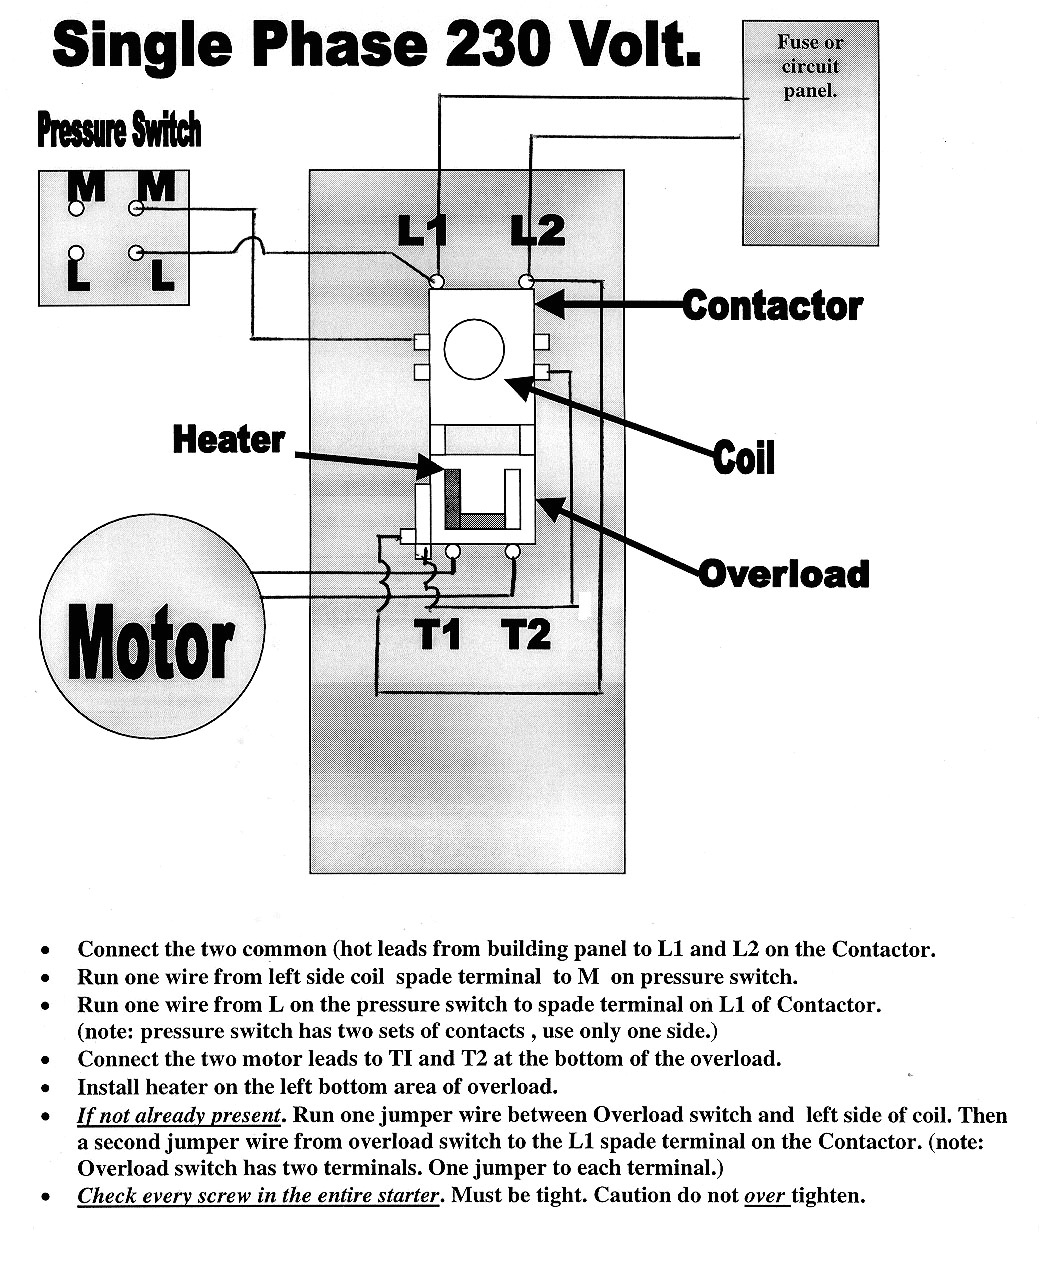 480v 3 phase motor wiring diagram beautiful cutler hammer starter wiring diagram elegant 3tf5222 0d contactors jpg